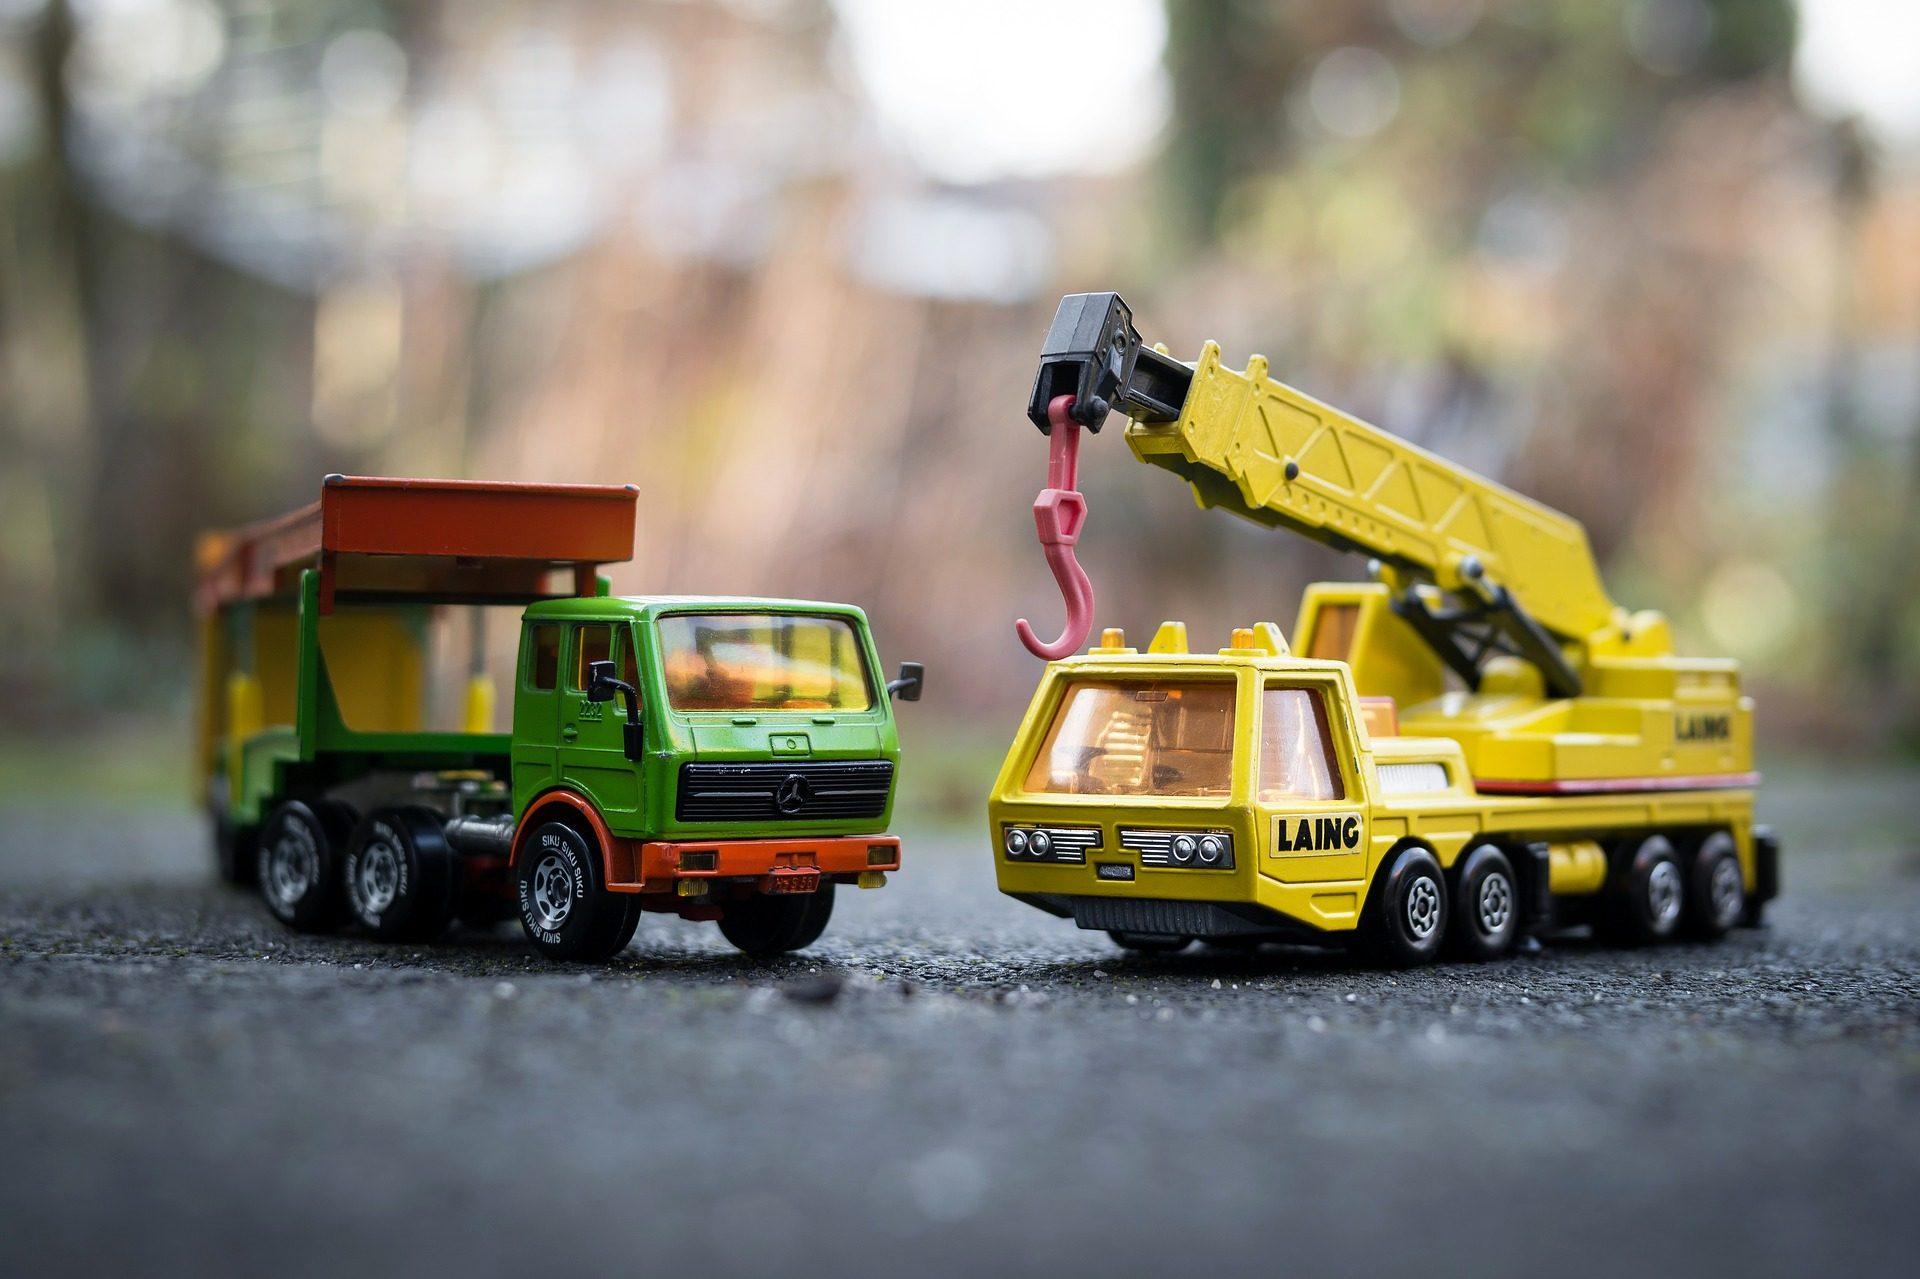 Giocattoli, Automobili, camion, gru, veicoli - Sfondi HD - Professor-falken.com